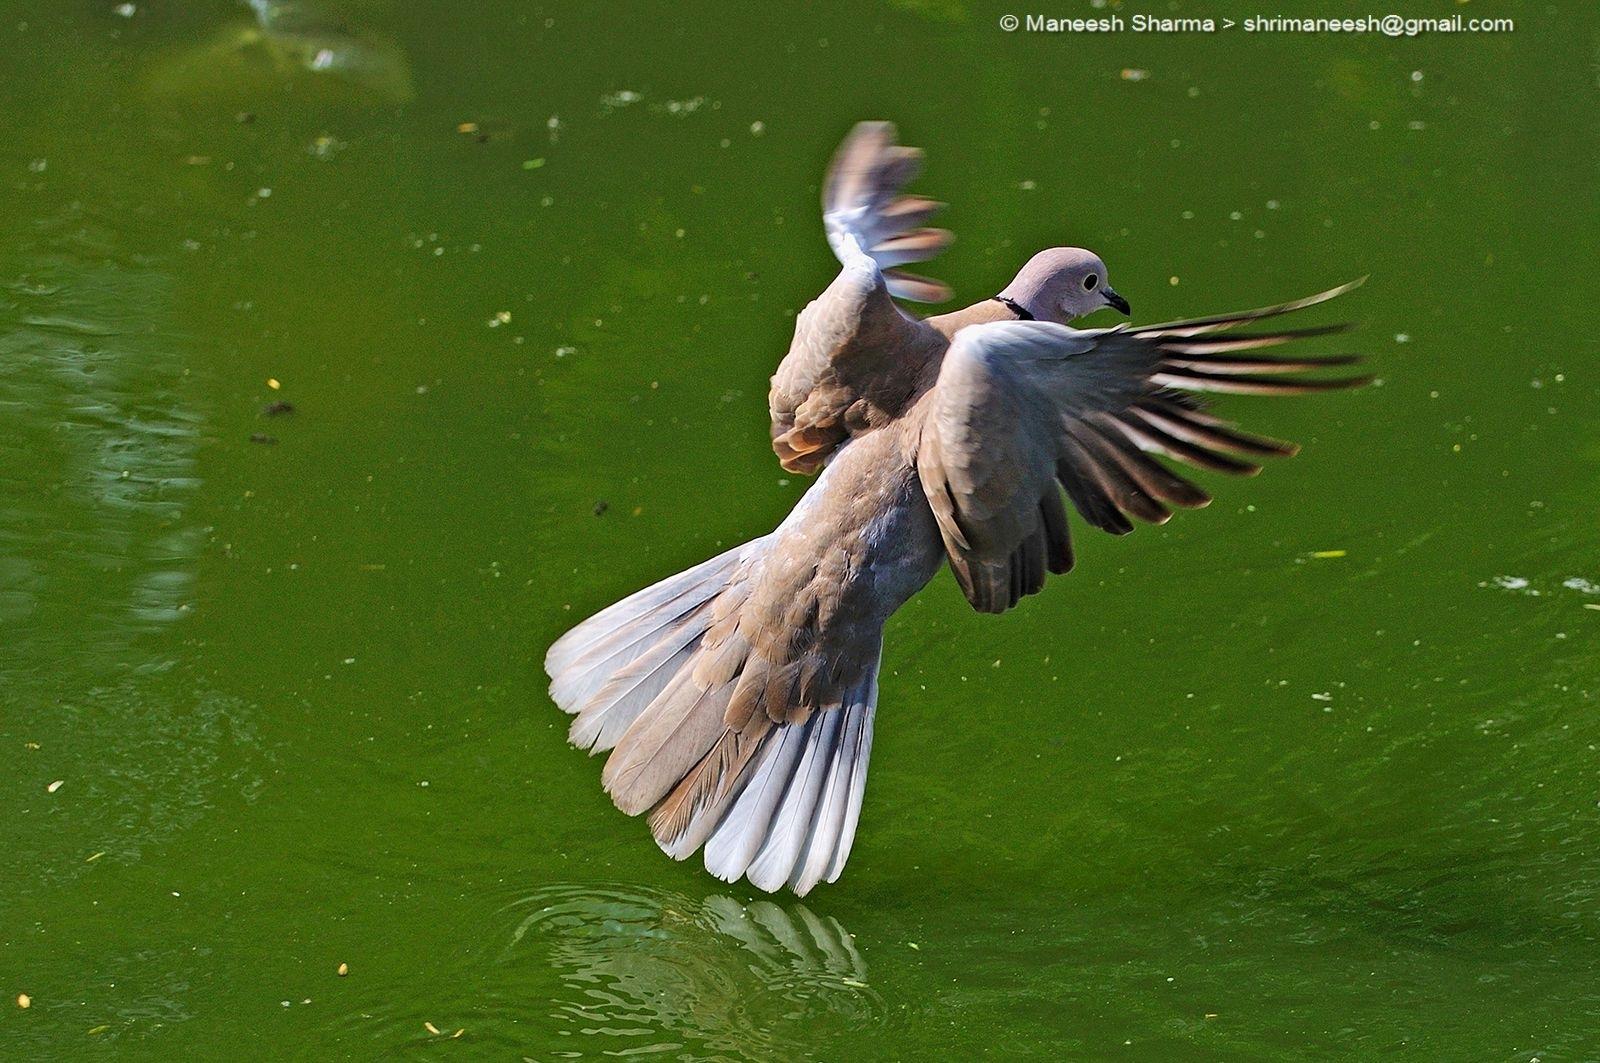 Eurasian collared dove....Scientific name: Streptopelia decaocto by Maneesh Sharma